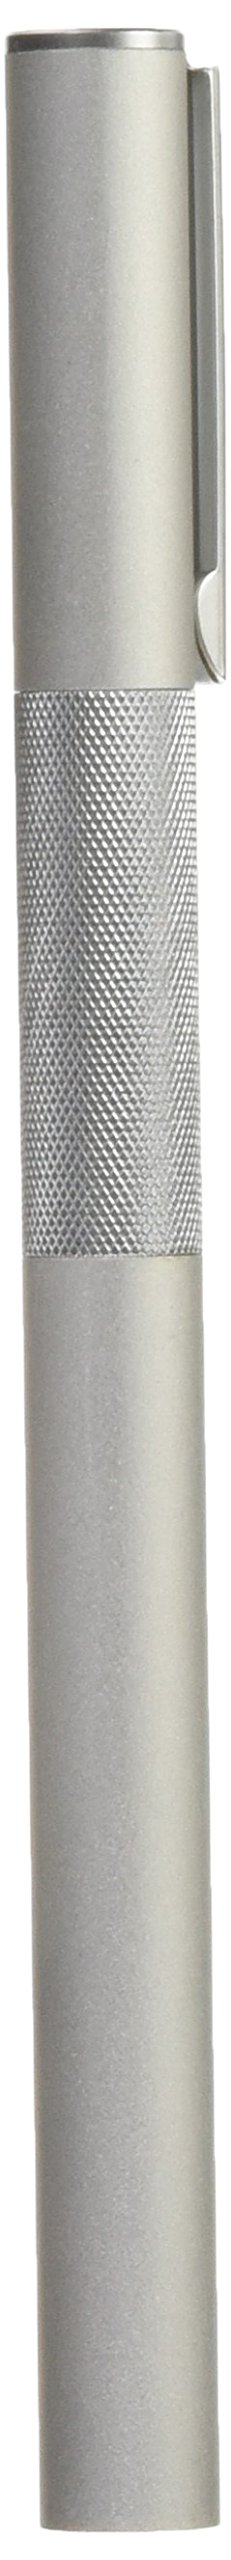 MUJI Aluminum Body Fountain Pen - Fine Nib - with 2 Refill Ink Cartridge